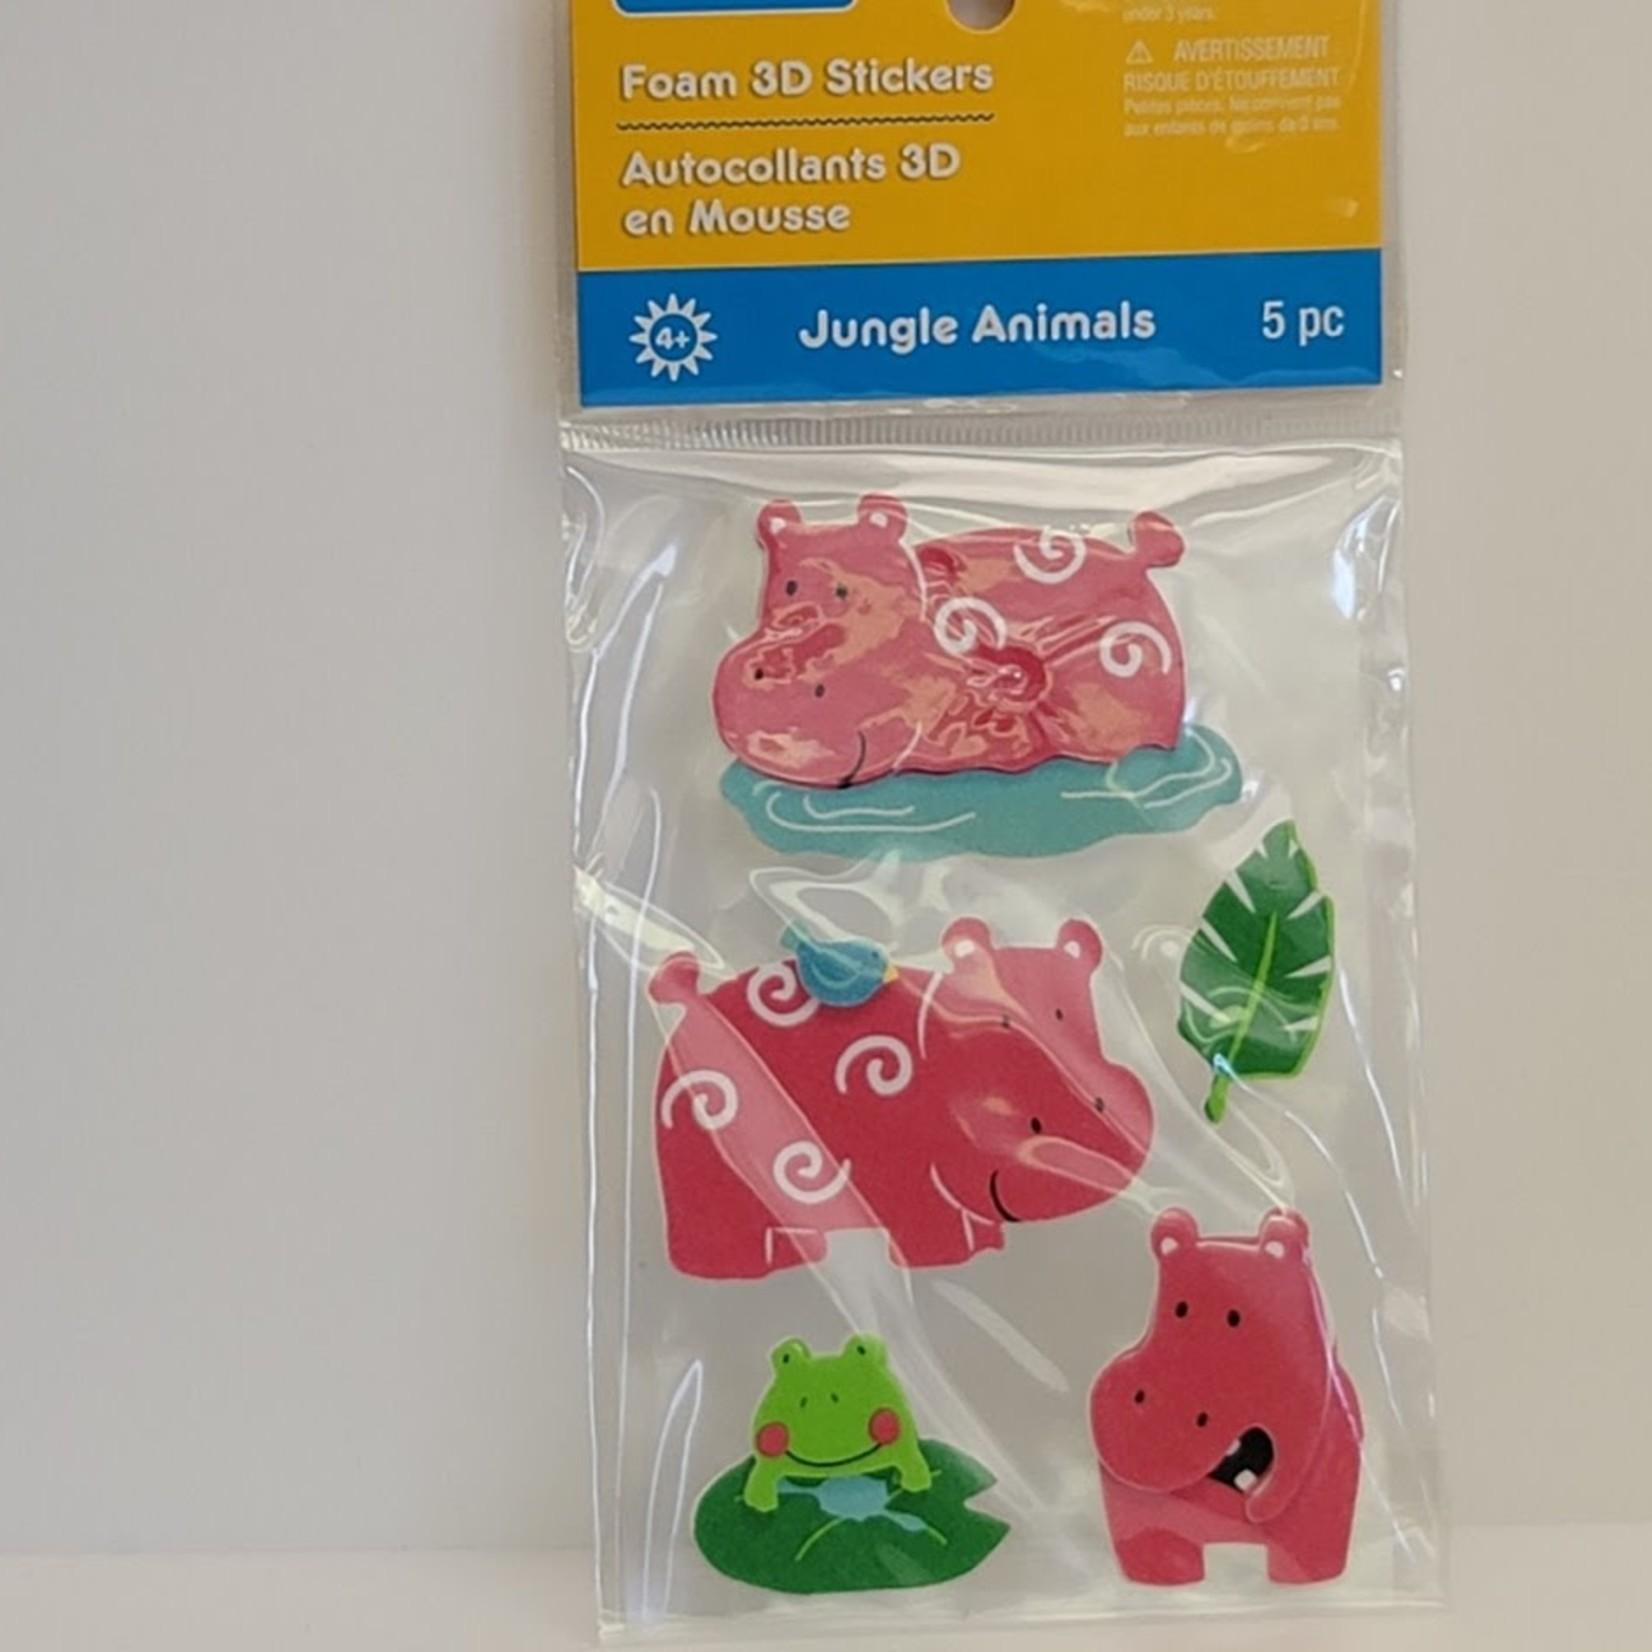 Foam 3D Stickers - Hippos